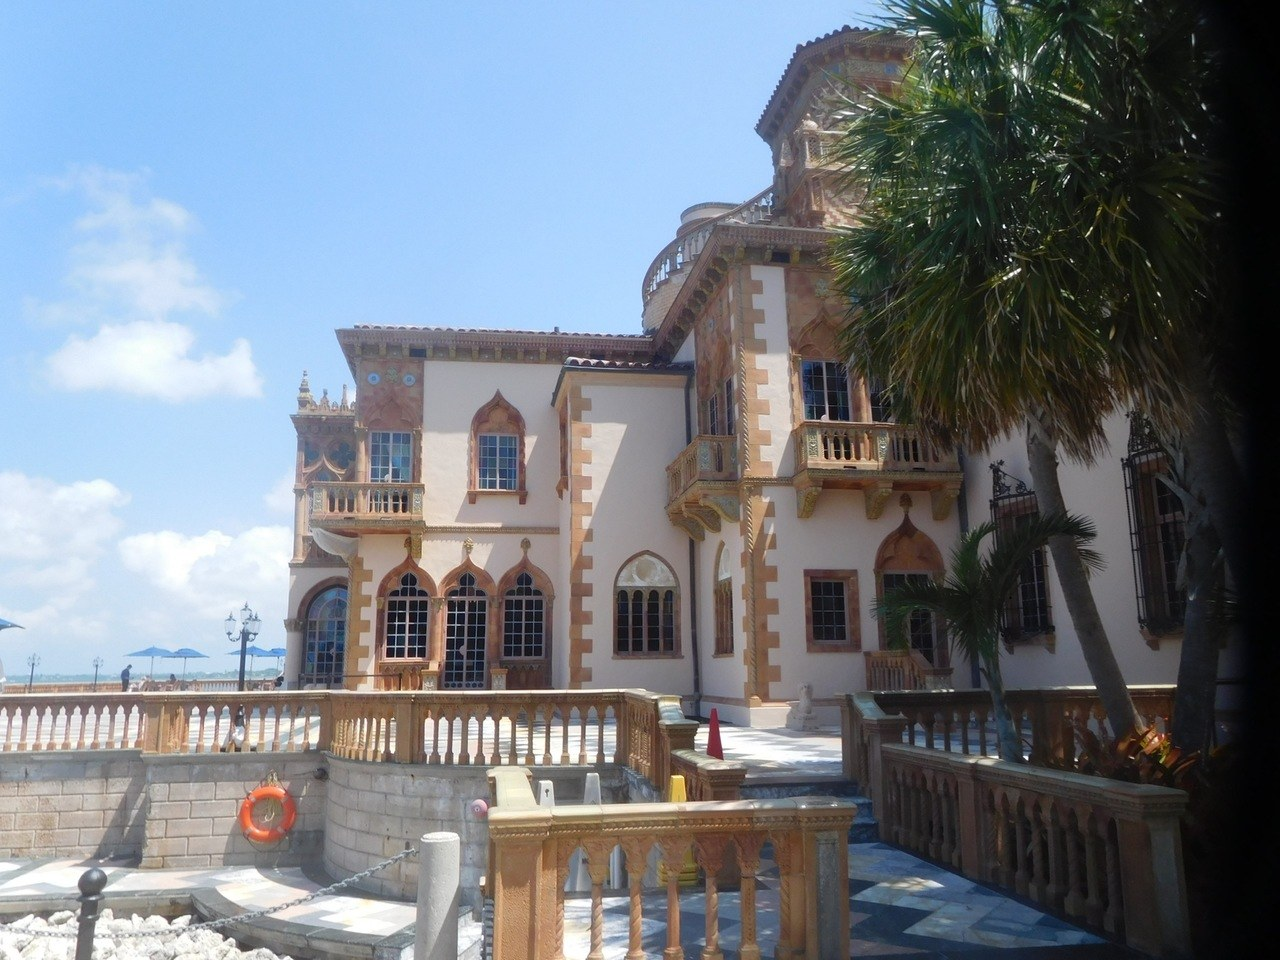 Ca' dZan Mansion au Ringling Museum à Sarasota / Floride